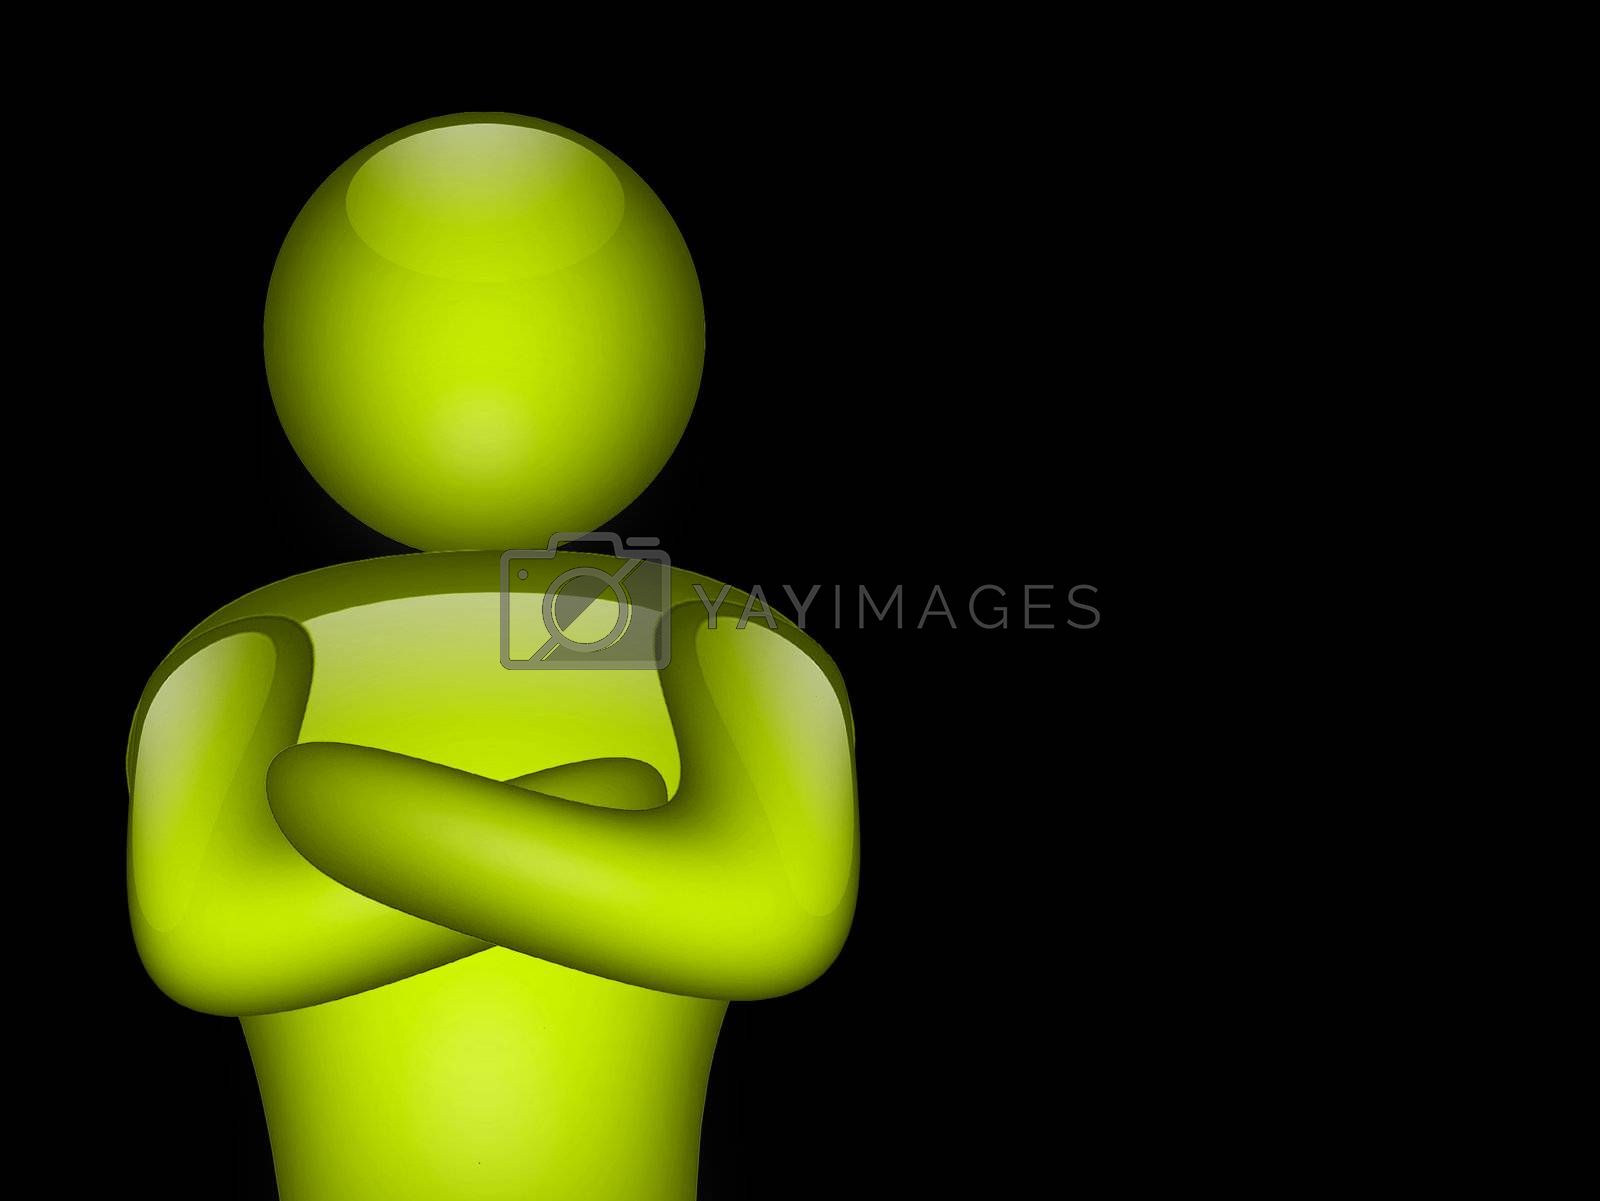 green man on black background